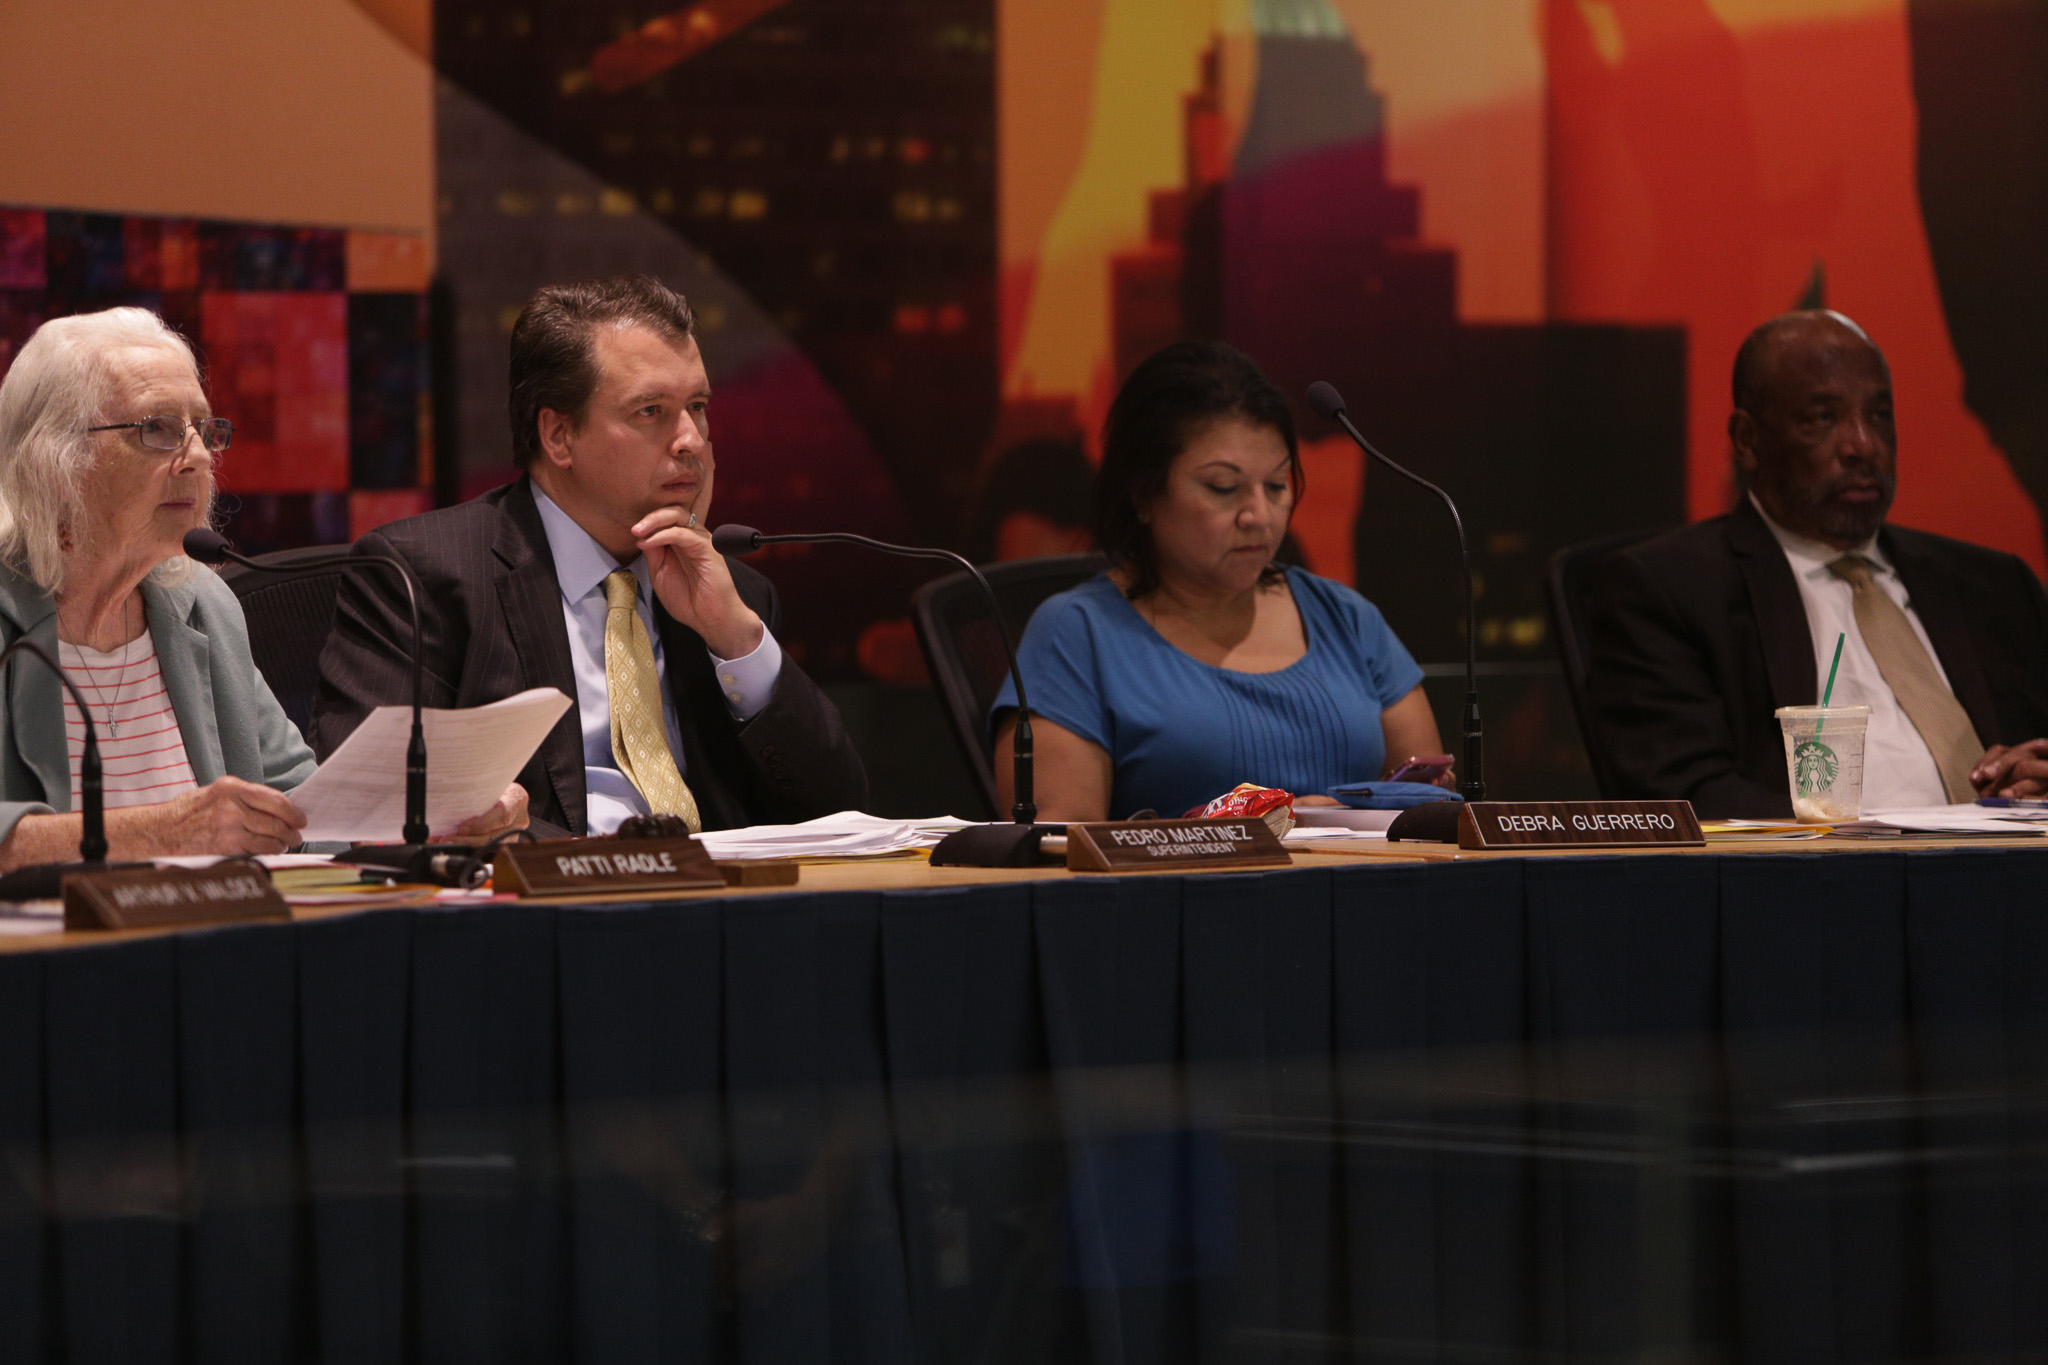 SAISD Board Trustees (from left) President Patti Radle, Superintendent Pedro Martinez, Debra Guerrero (D3), and James Howard (D2).